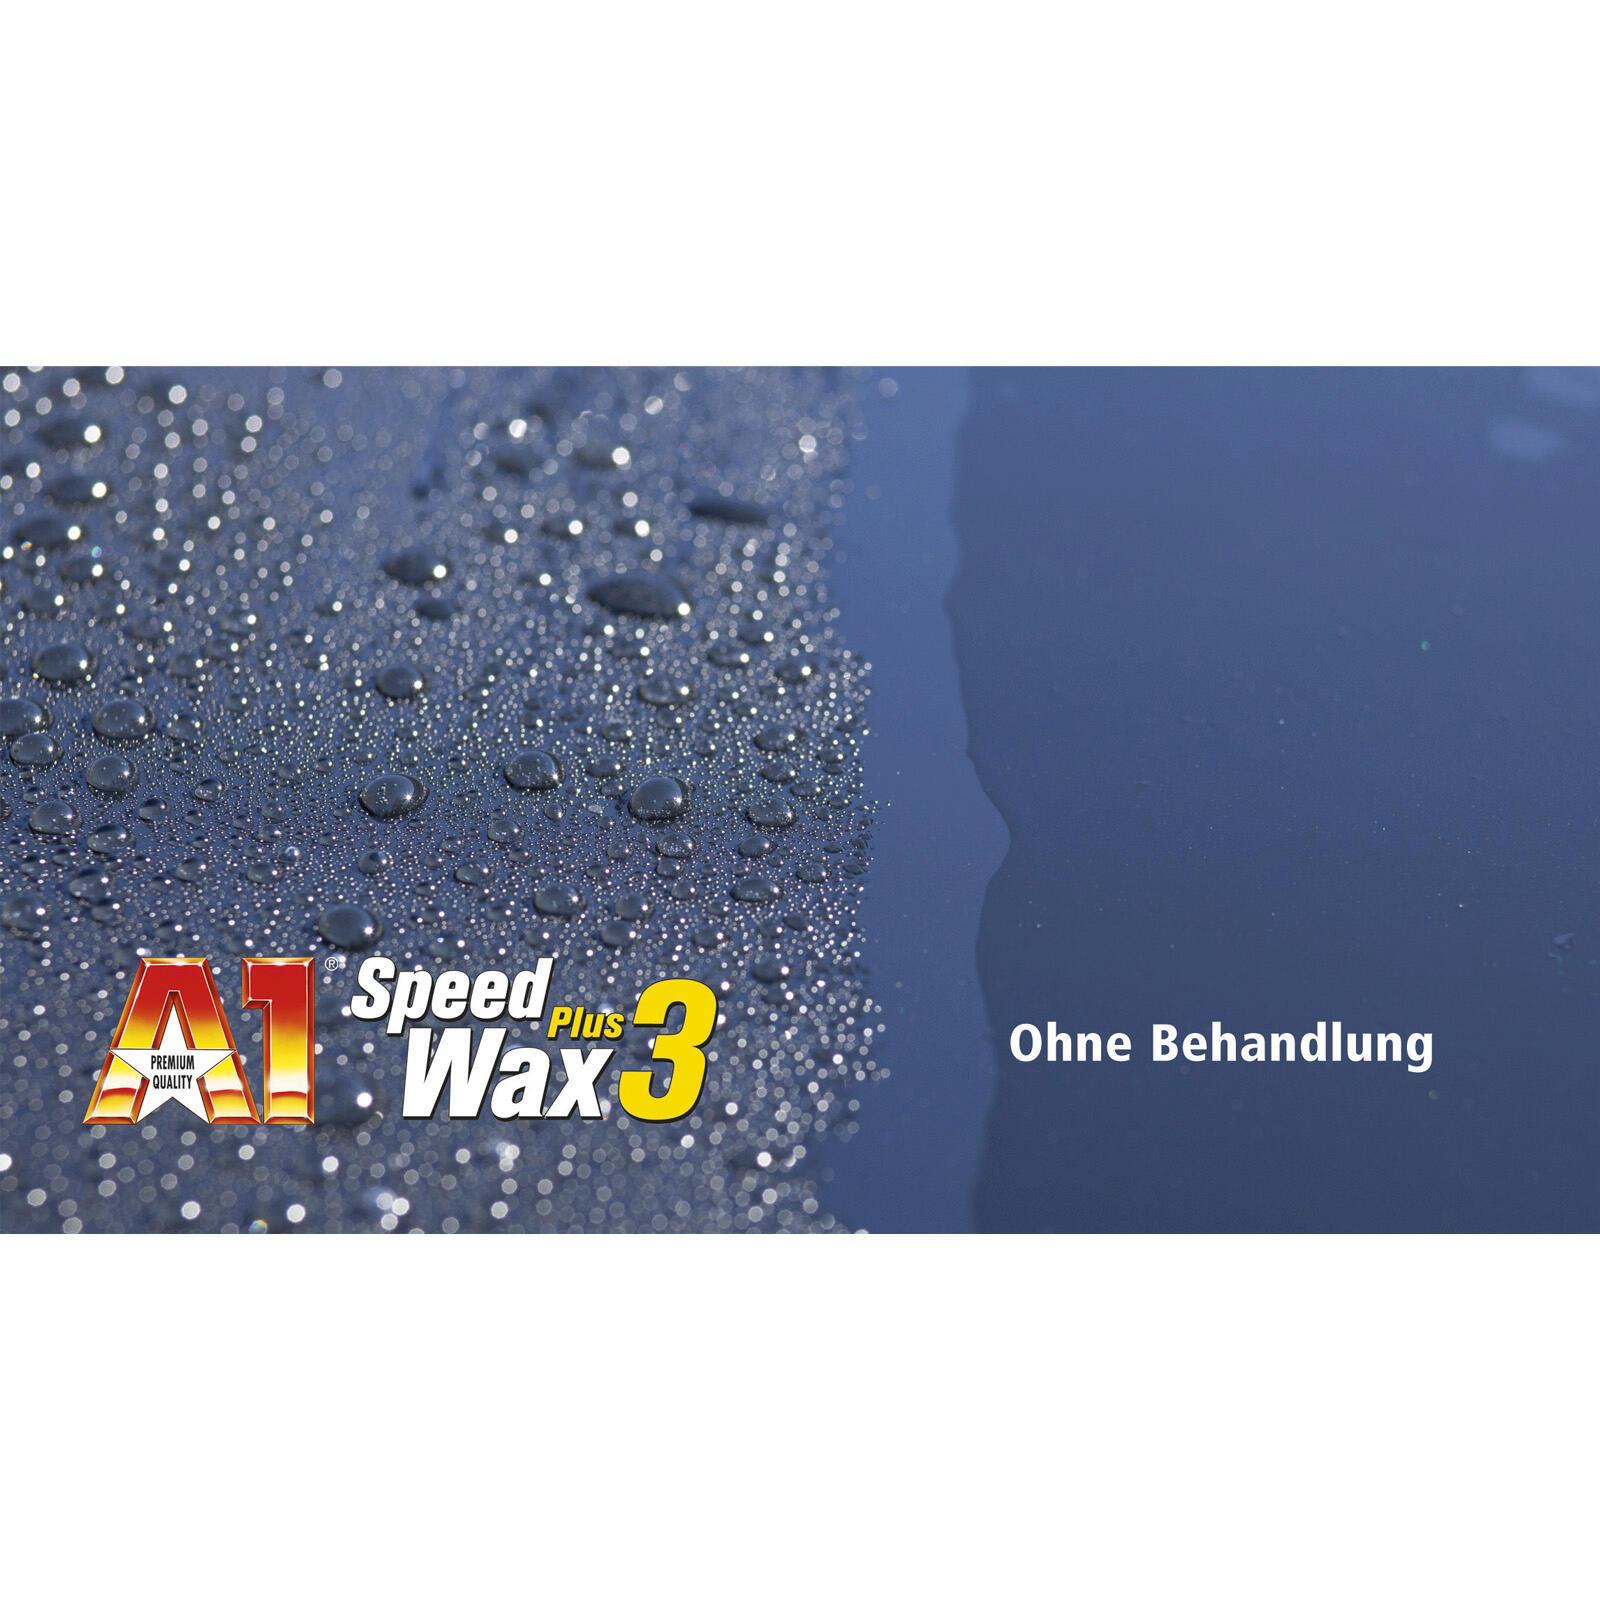 DR. WACK A1 Speed Wax Plus 3 Wachs Lack Pflege Versiegelung